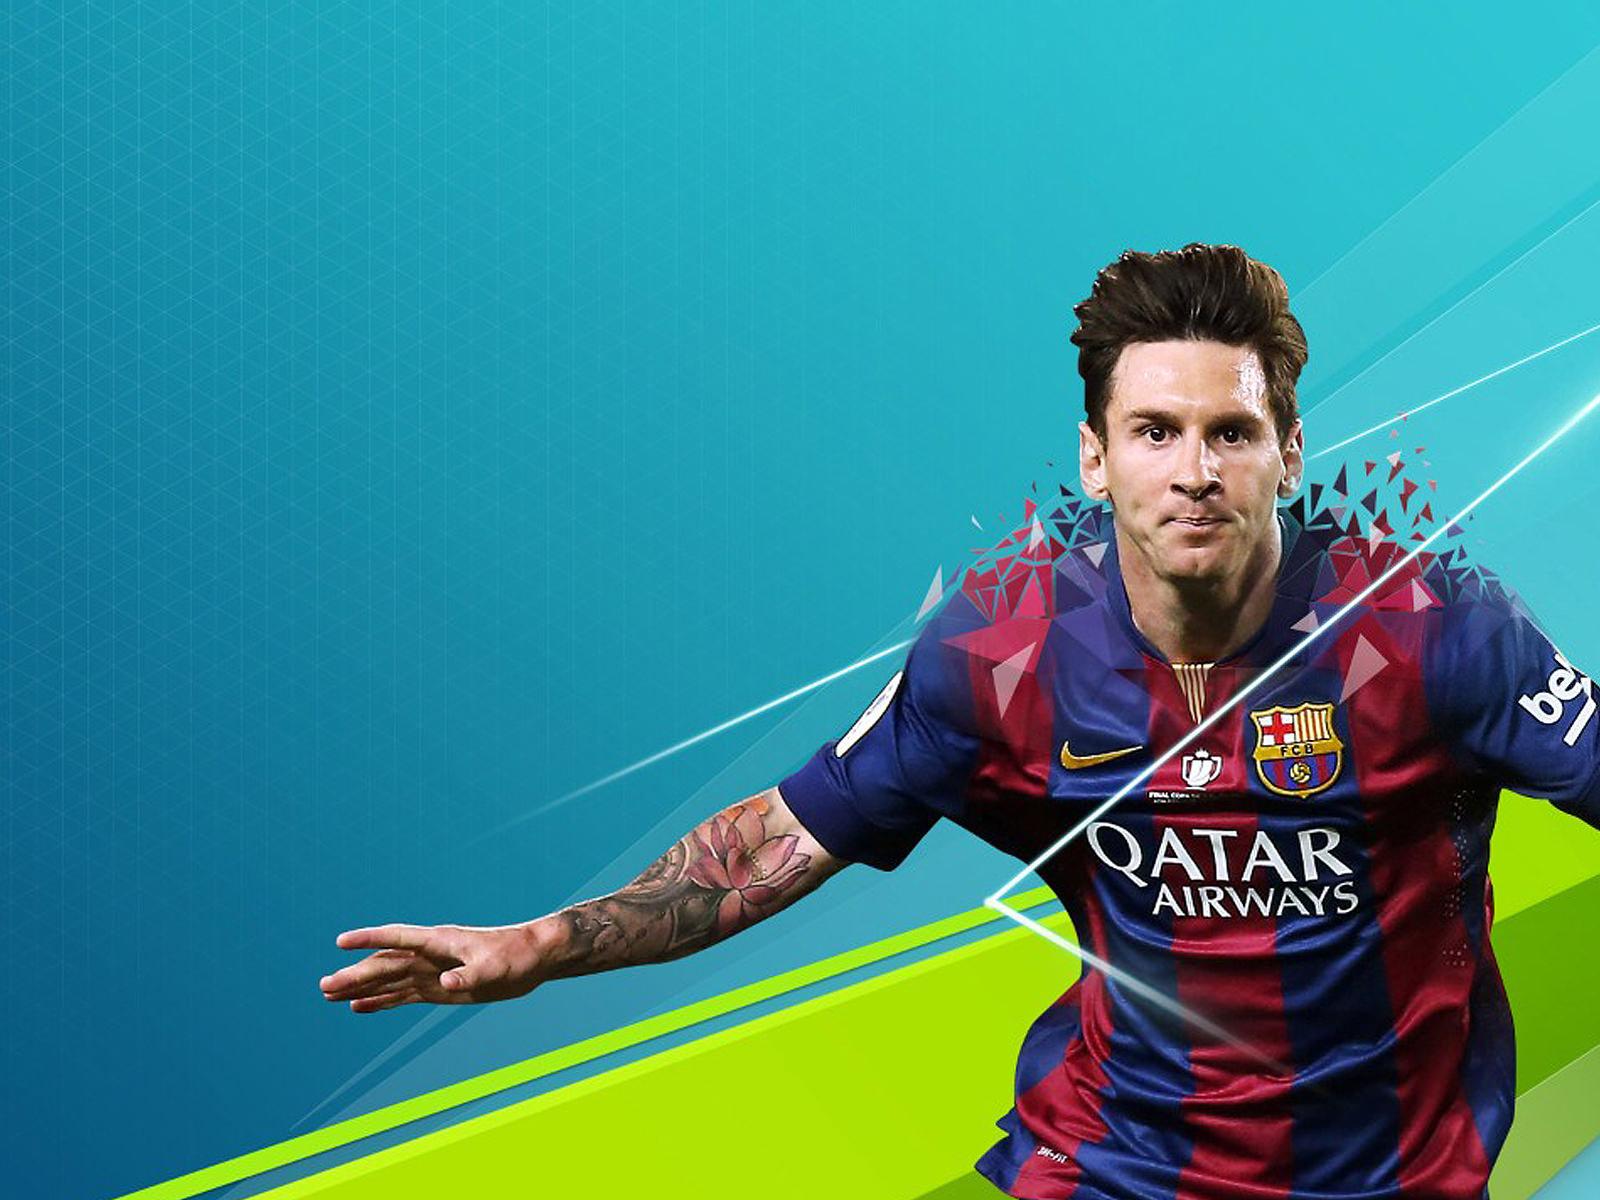 Download FIFA 16 Wallpaper Messi